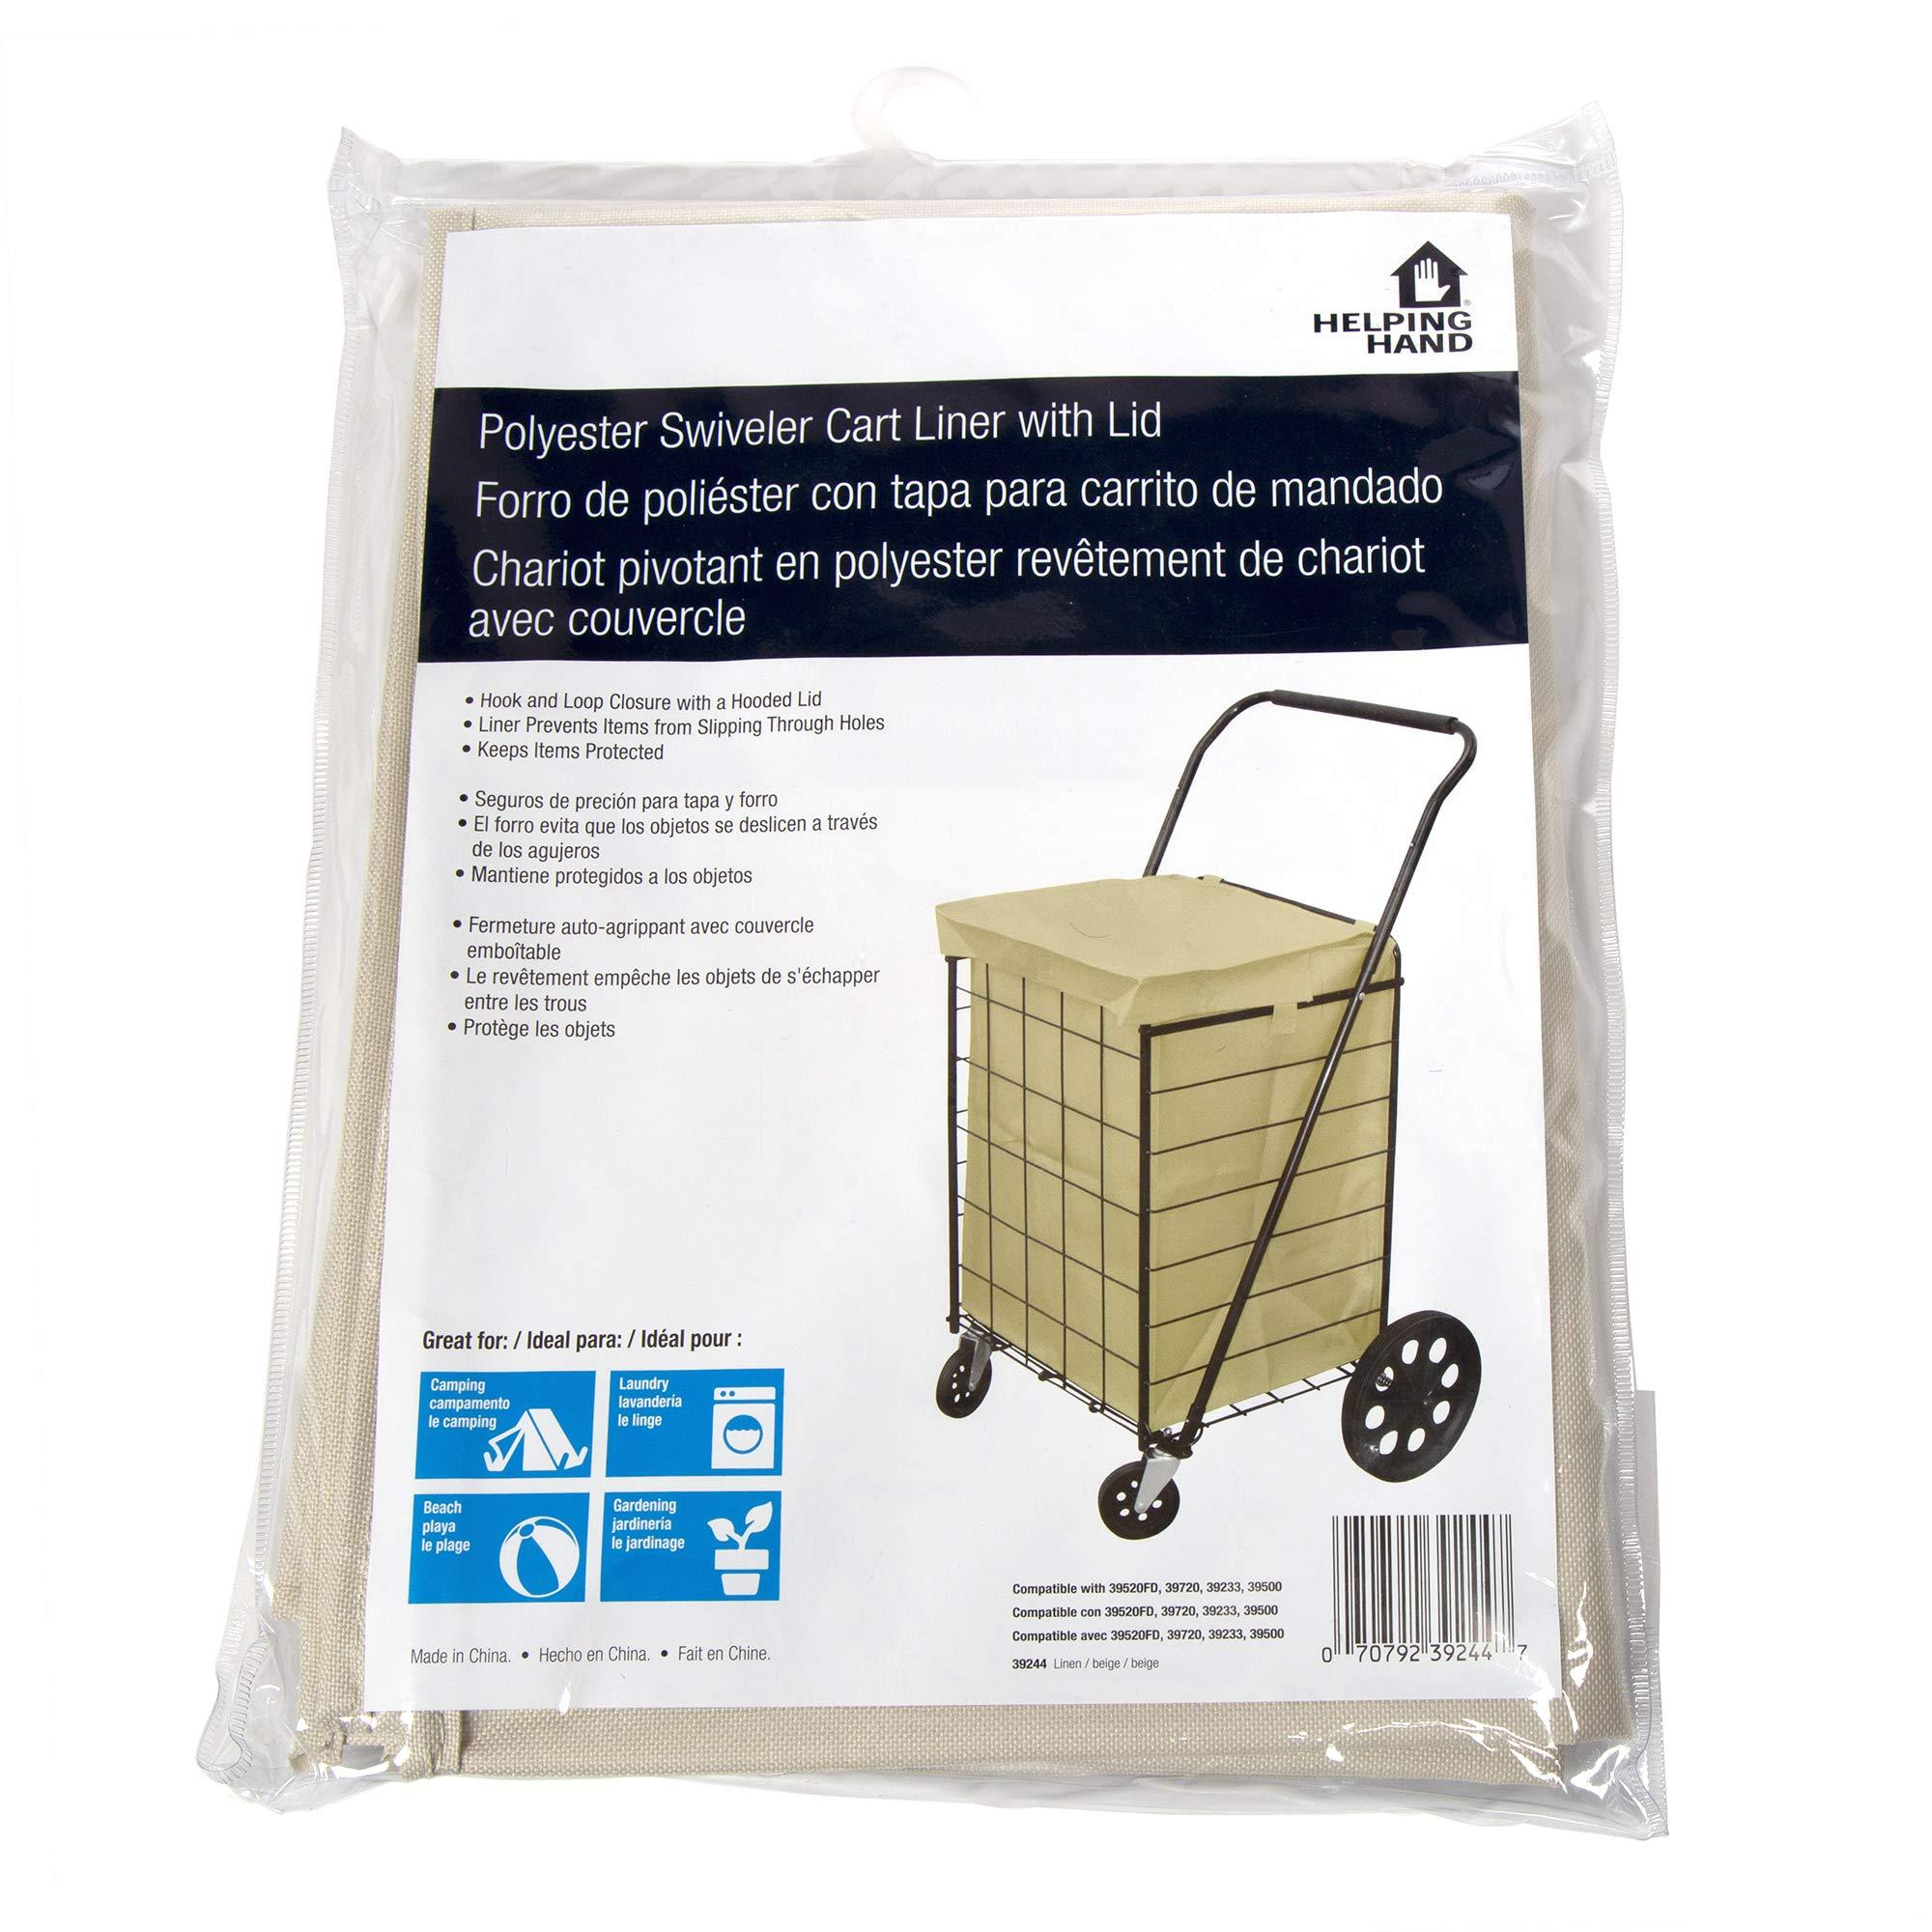 Helping Hand Cart Liner (Linen, Large) - Designed for Swiveler Cart